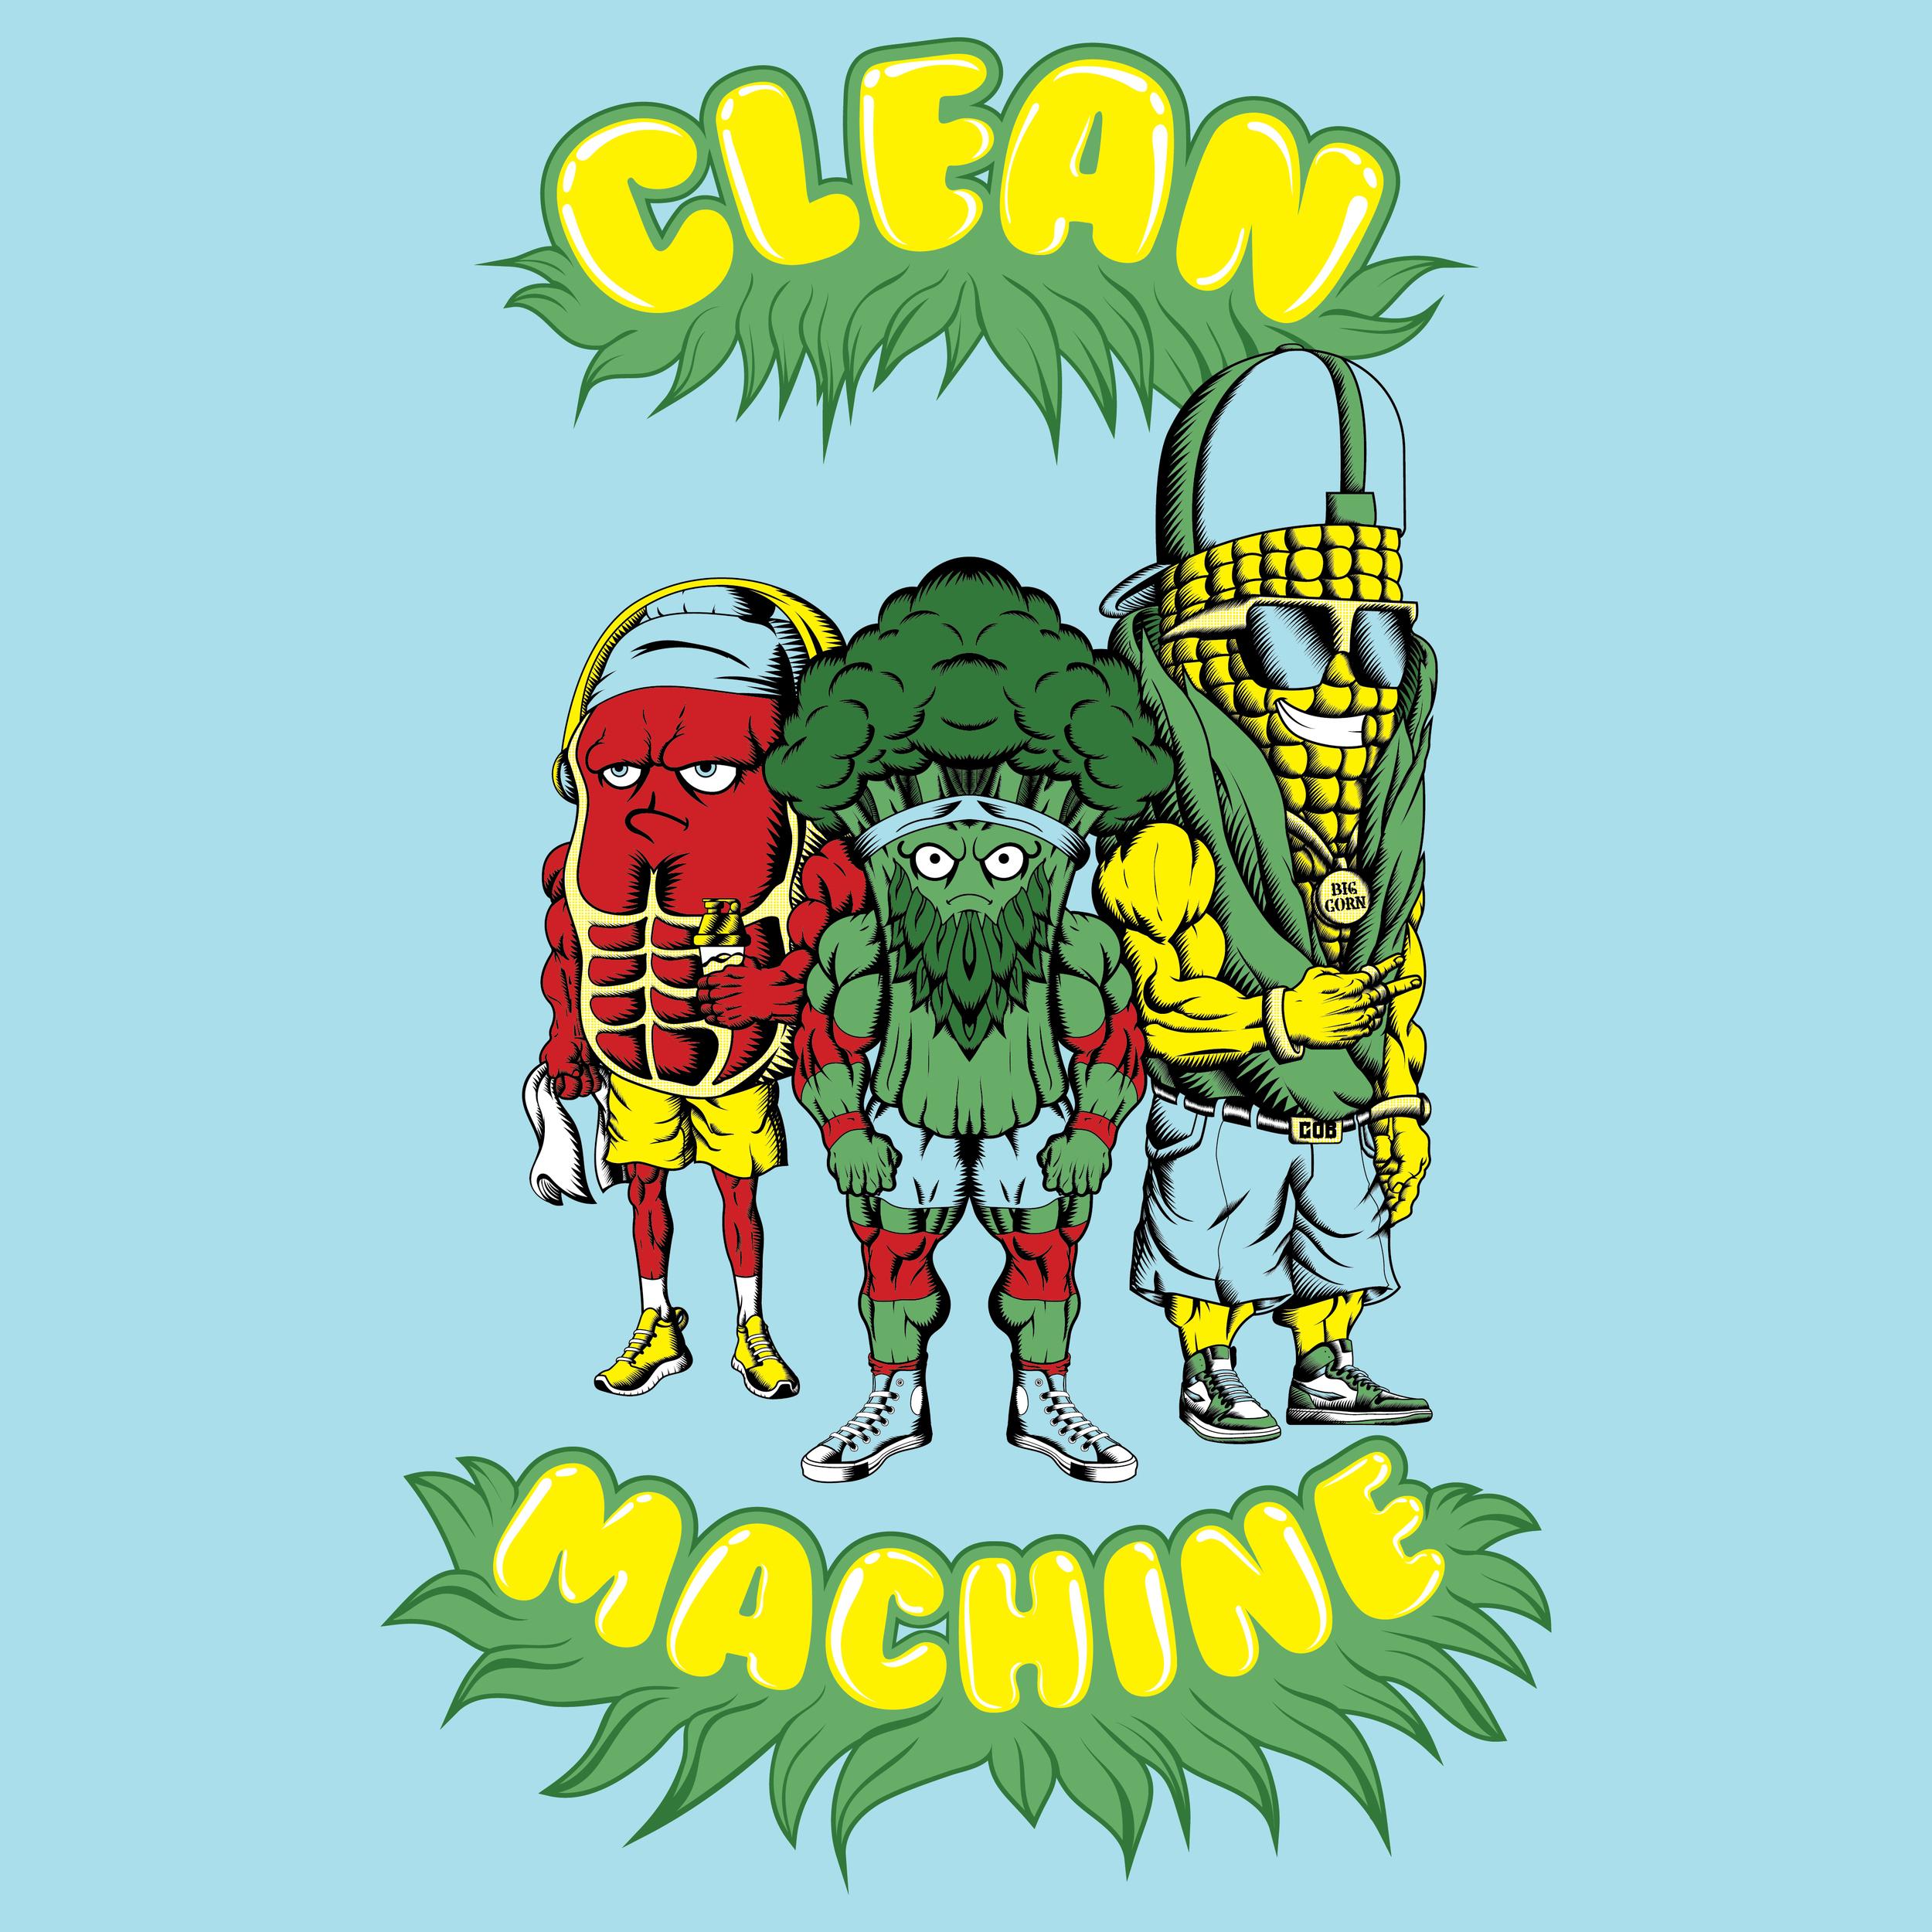 cleanmachine-clean-machine-raskol-apparel-omar-isuf-roberto-artist-orozco-design-studio-steak-broccoli-corn-gym-bros-blue-red-yellow-illustration-illustrator-vector-digital-image.jpg